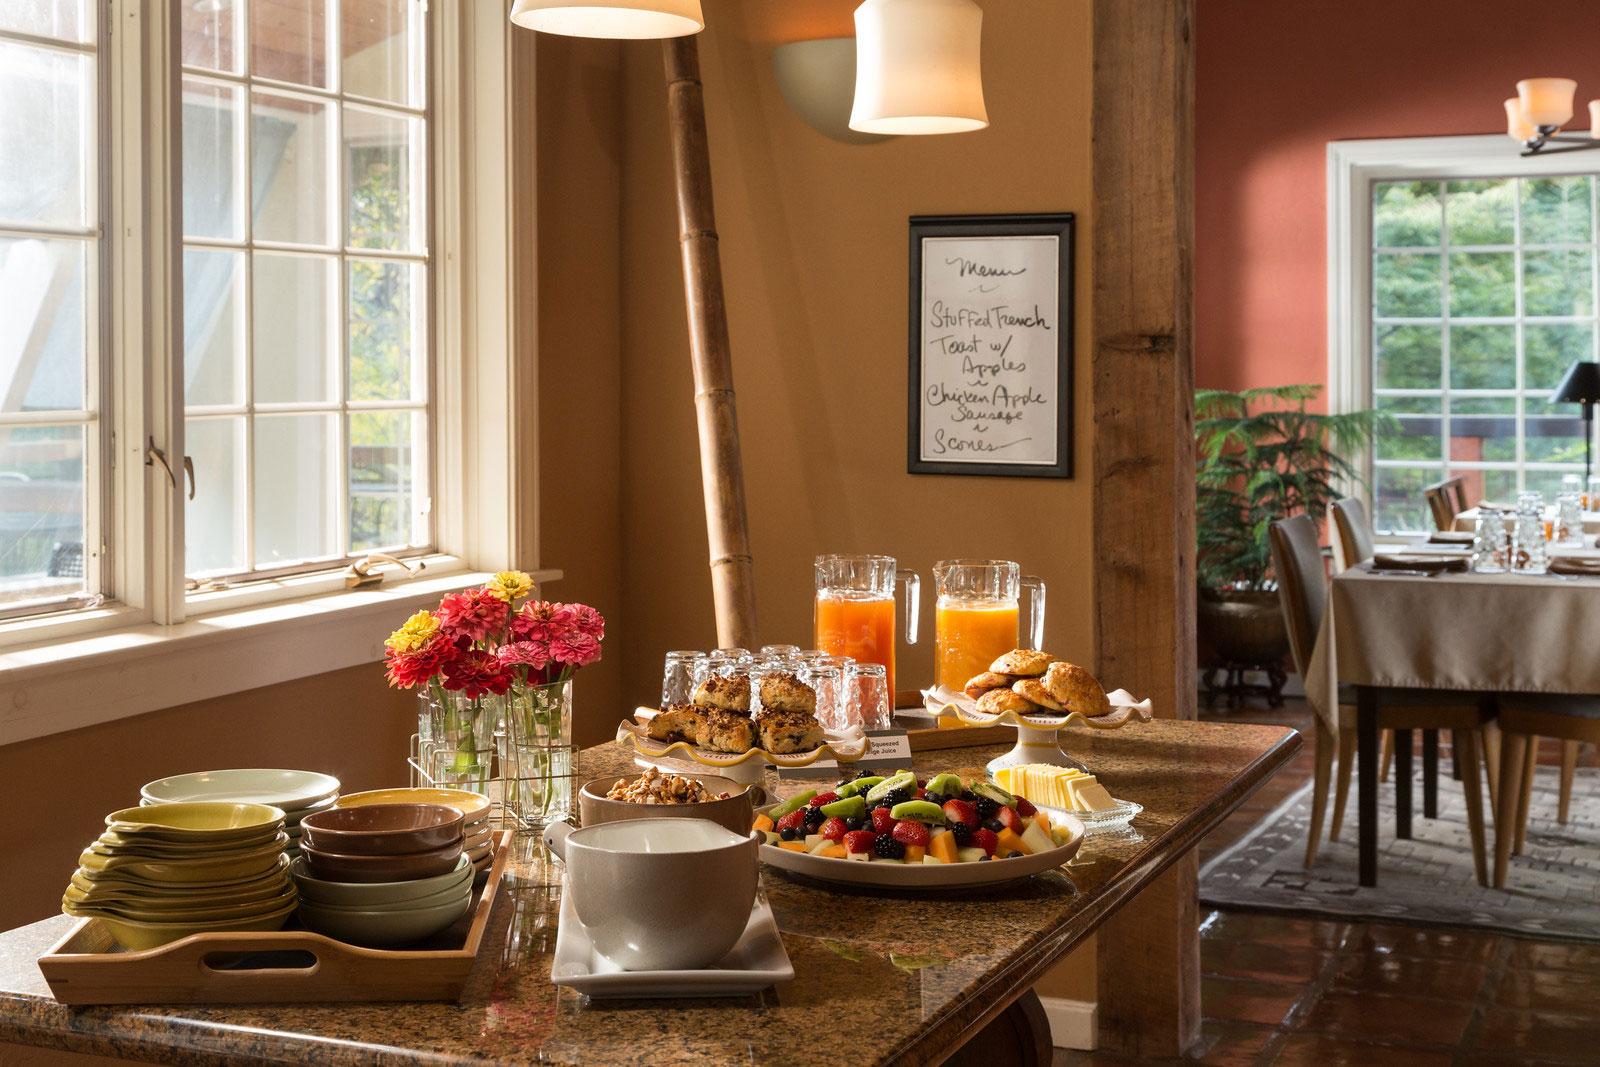 Eden-Vale-Breakfast-4-X3-4 - David Browning